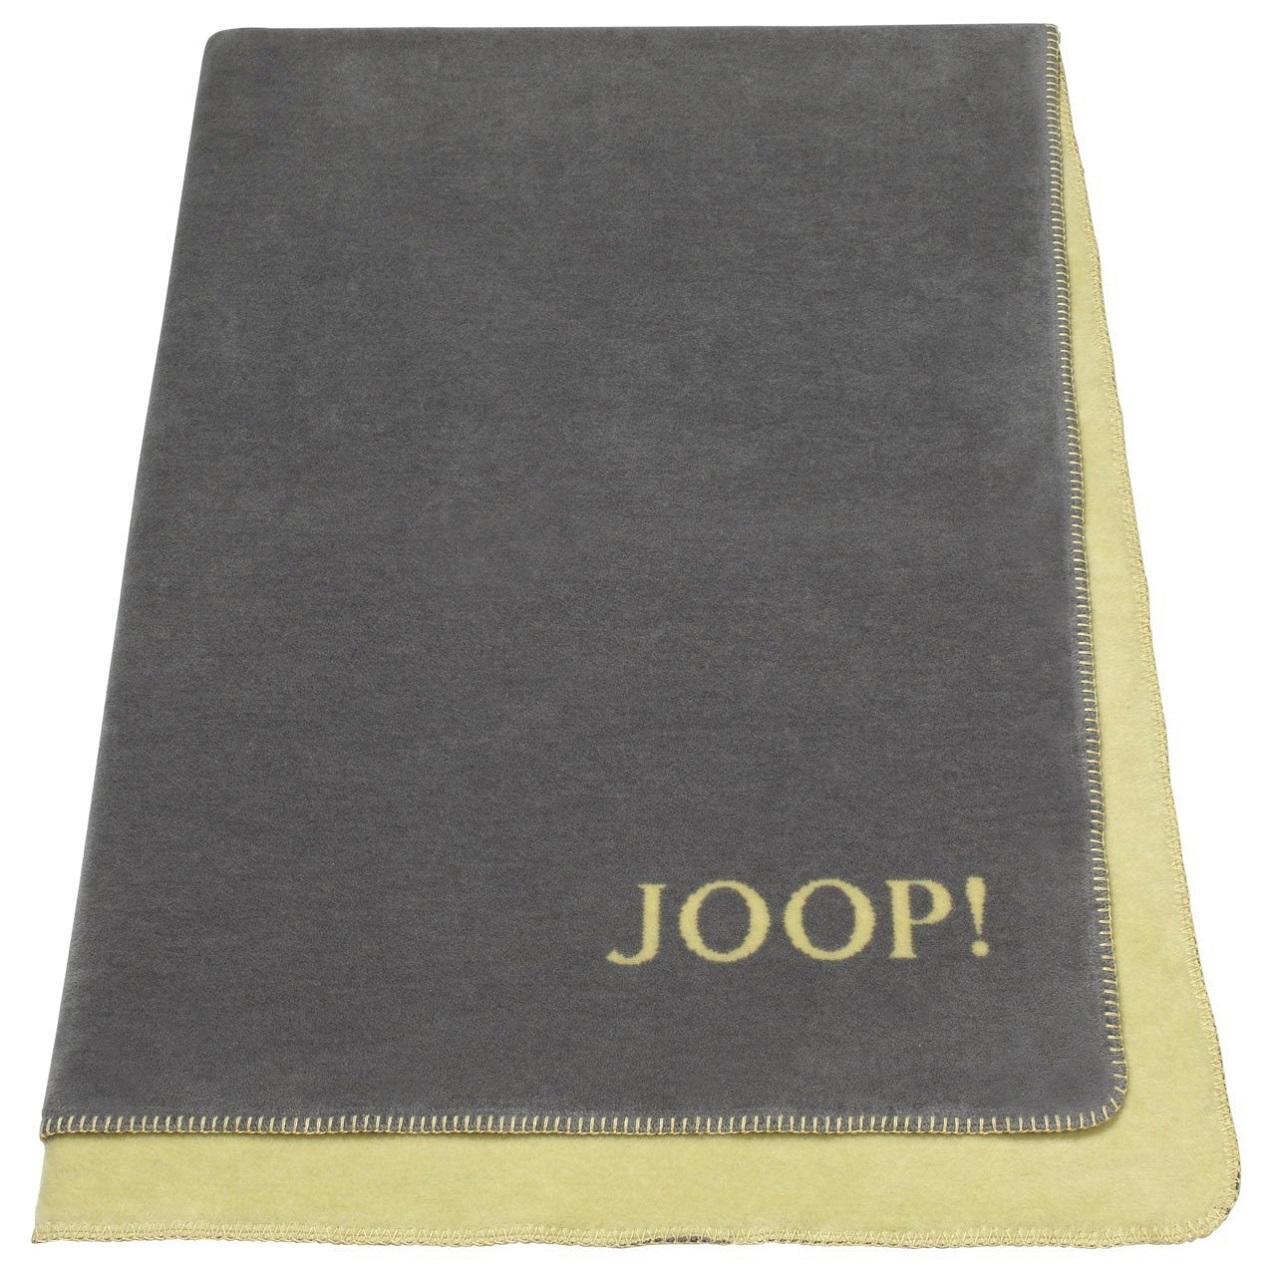 joop uni doubleface wohndecke 606938 graphit schwefel kuscheldecke decke ebay. Black Bedroom Furniture Sets. Home Design Ideas